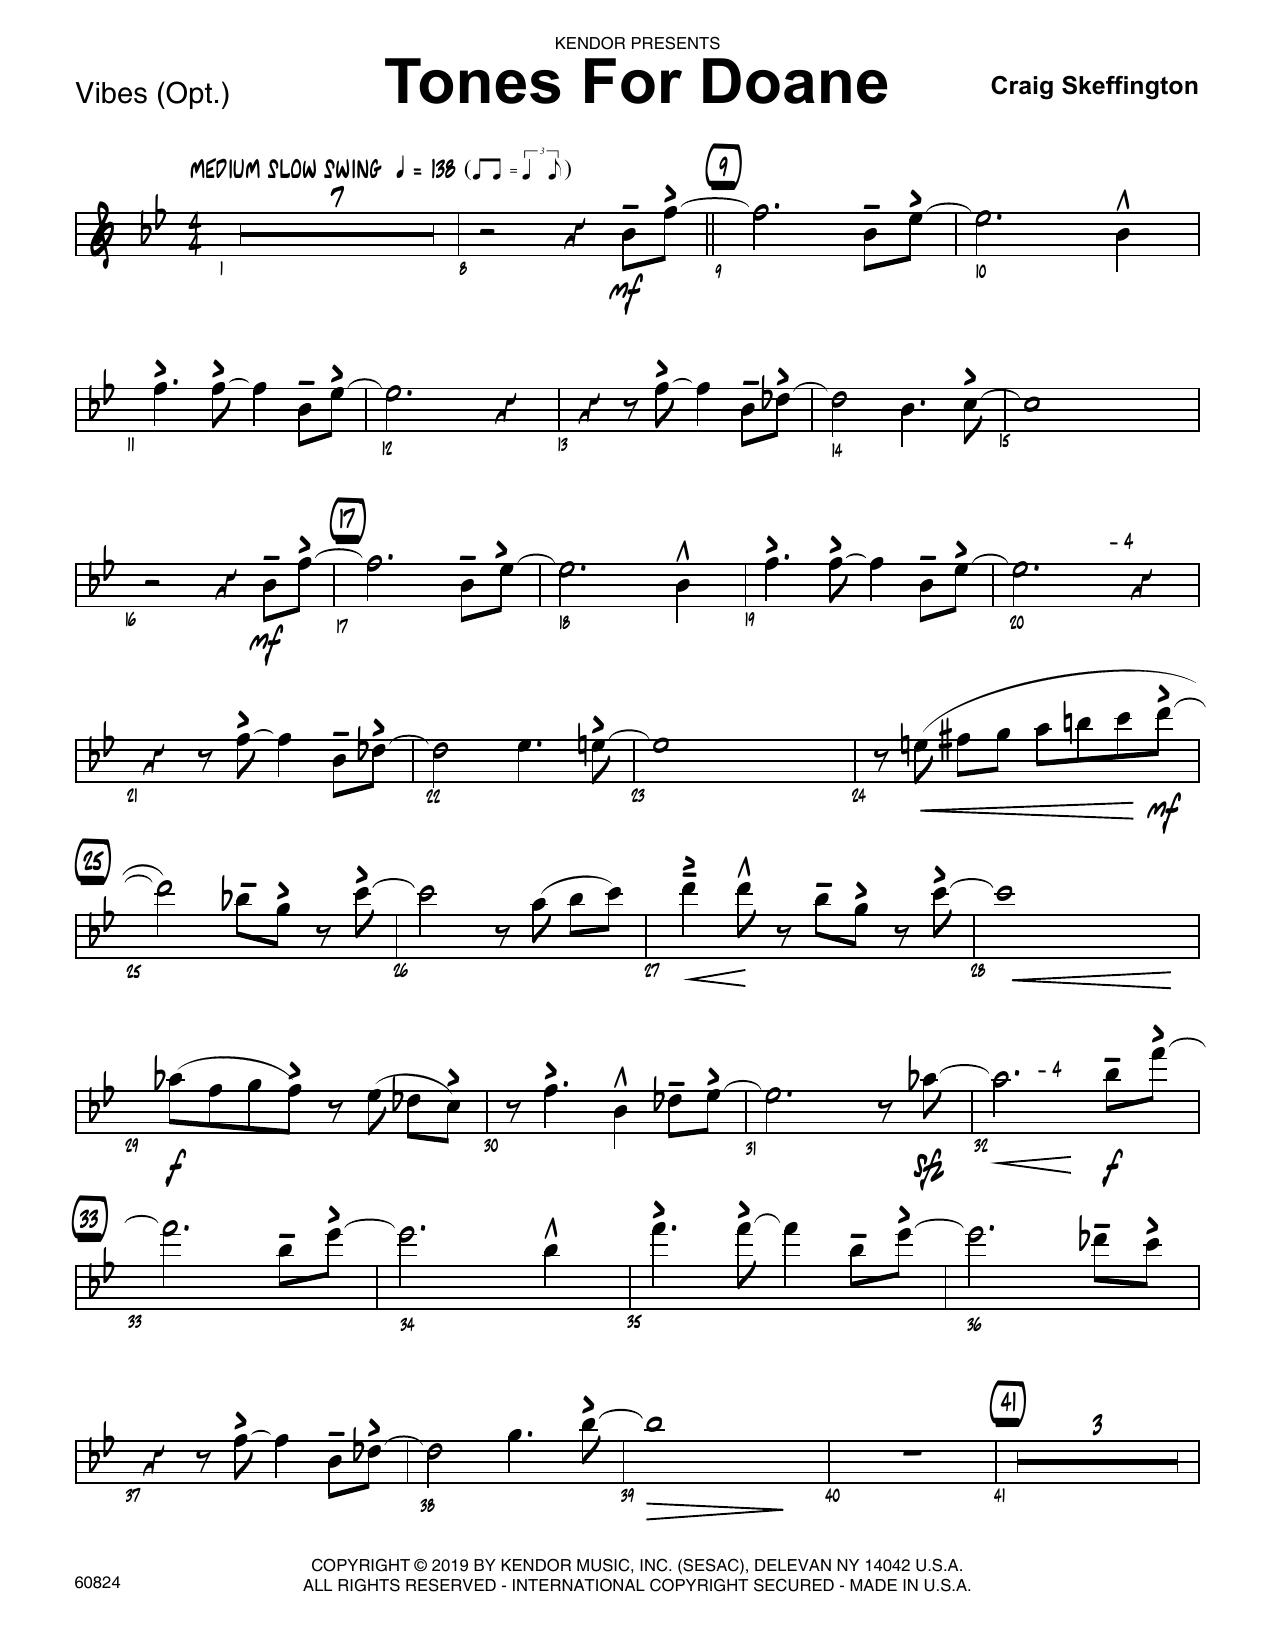 Craig Skeffington Tones For Doane - Vibes sheet music notes and chords. Download Printable PDF.